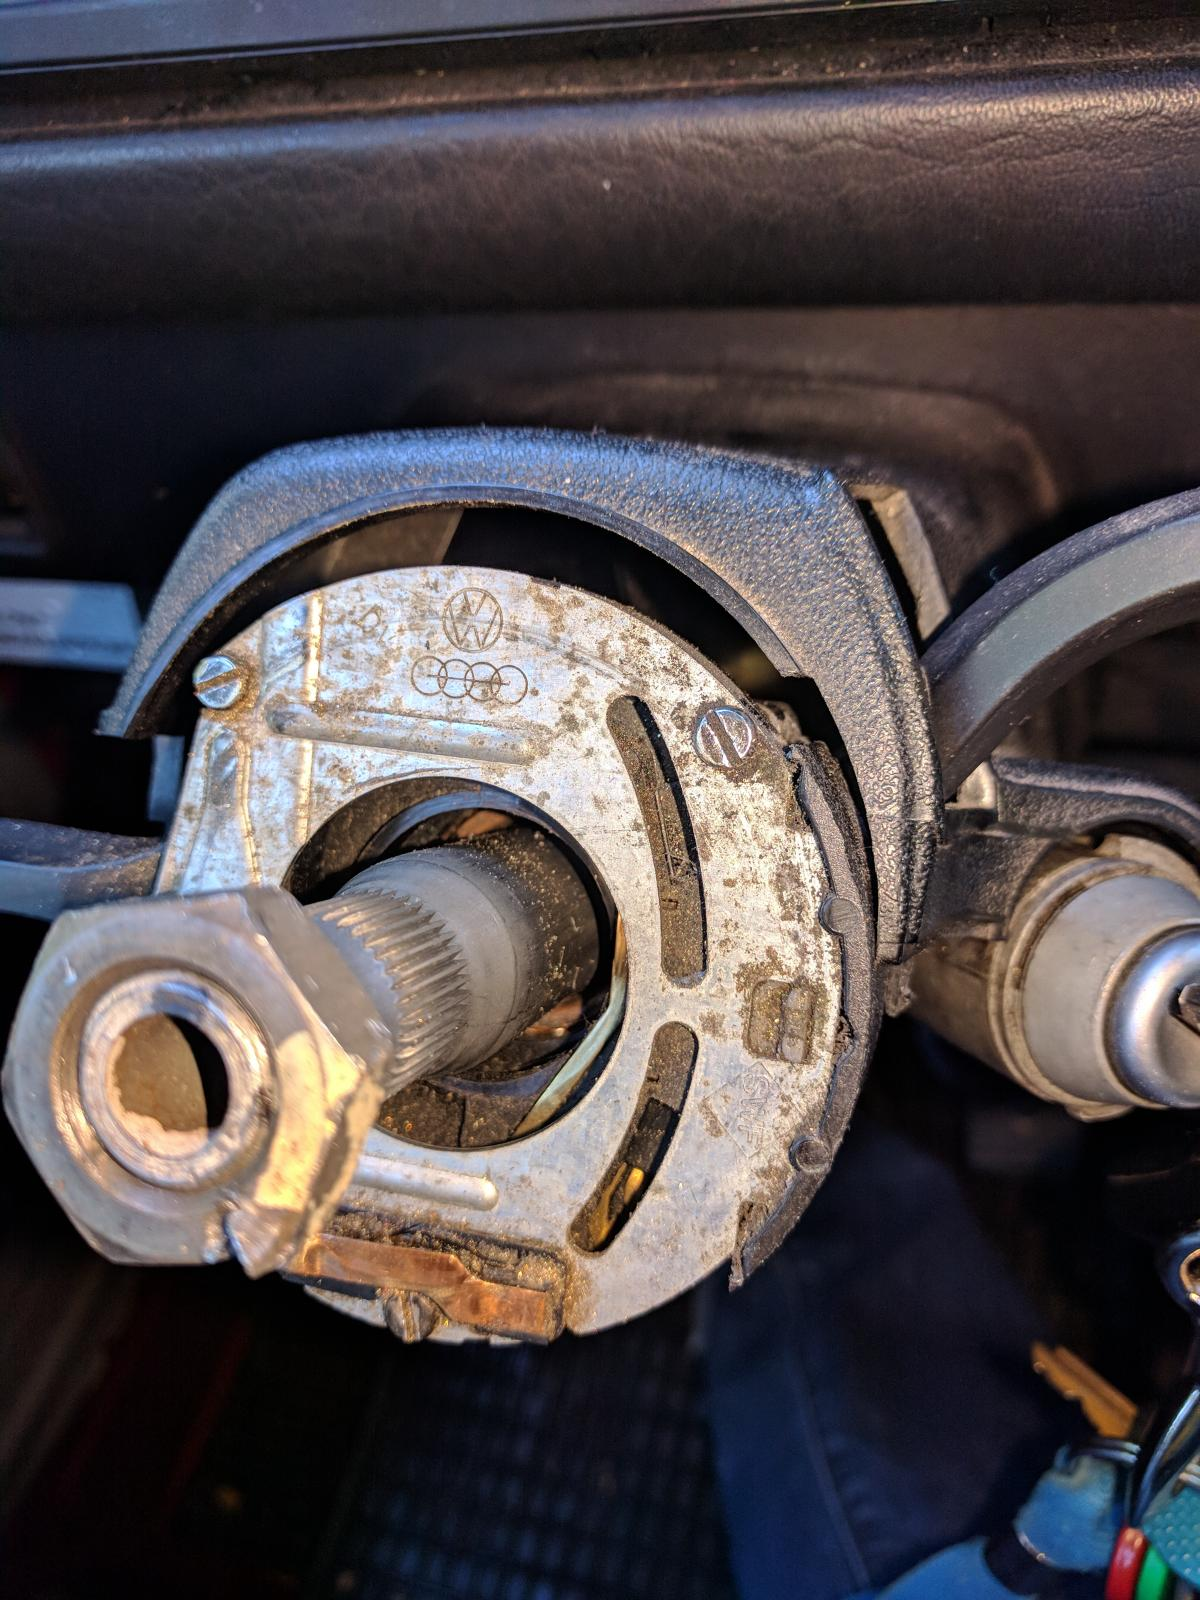 Horn Ring problem on 1989 Vanagon